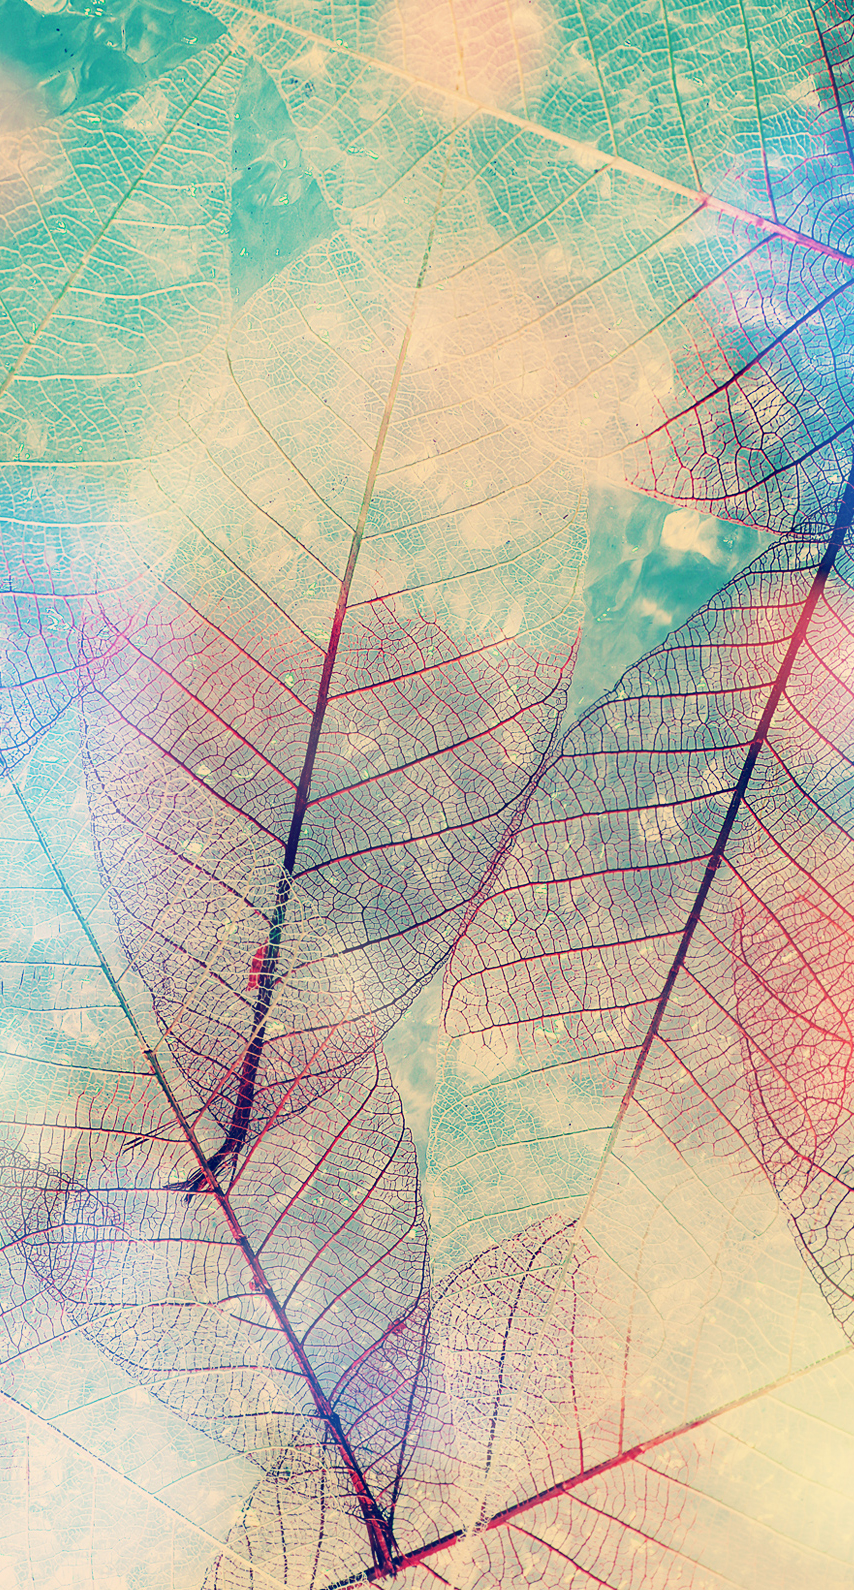 artistic, art, graphic, paper, design, background, wallpaper, desktop, shape, color